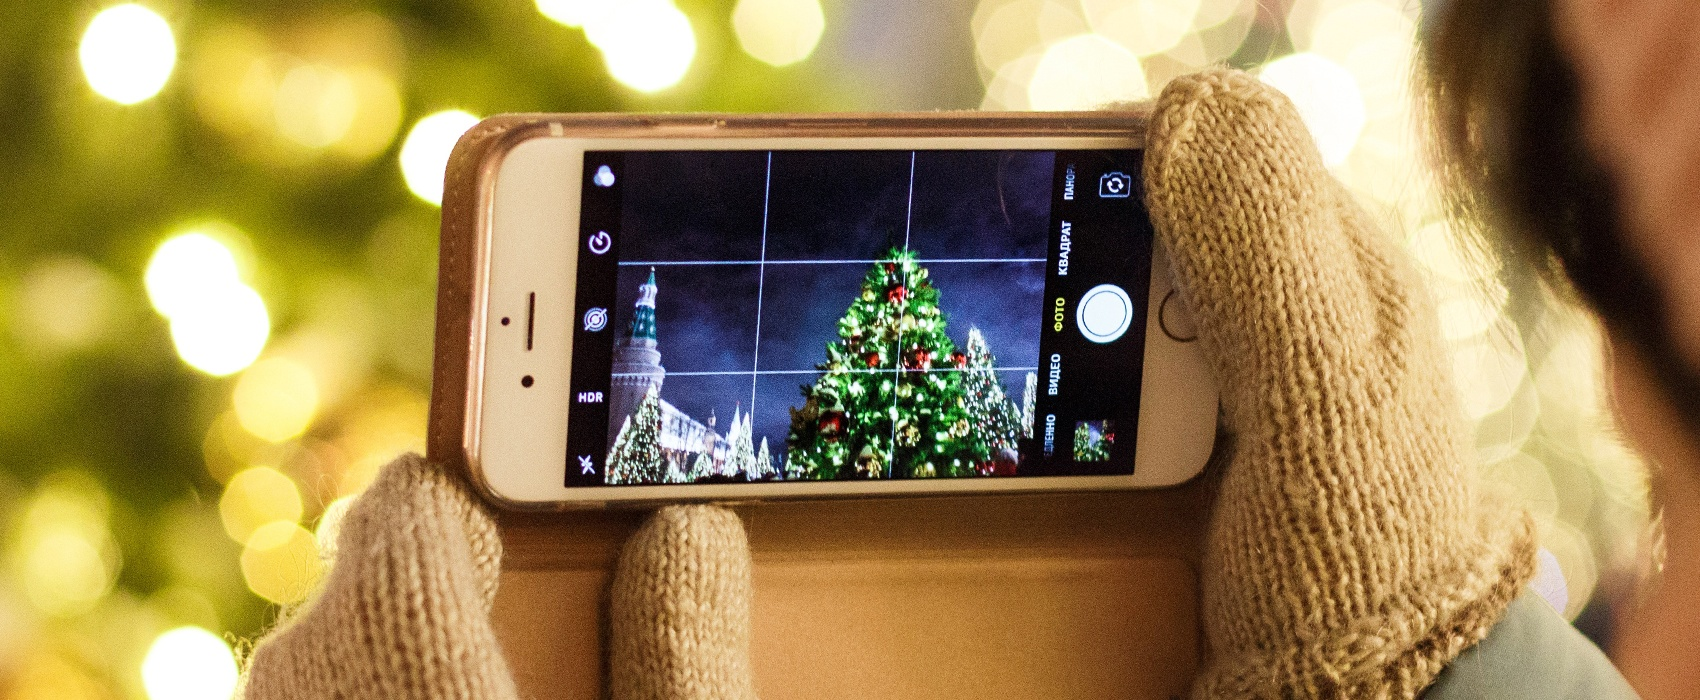 Christmas Video - Mobile MArketing Ideas